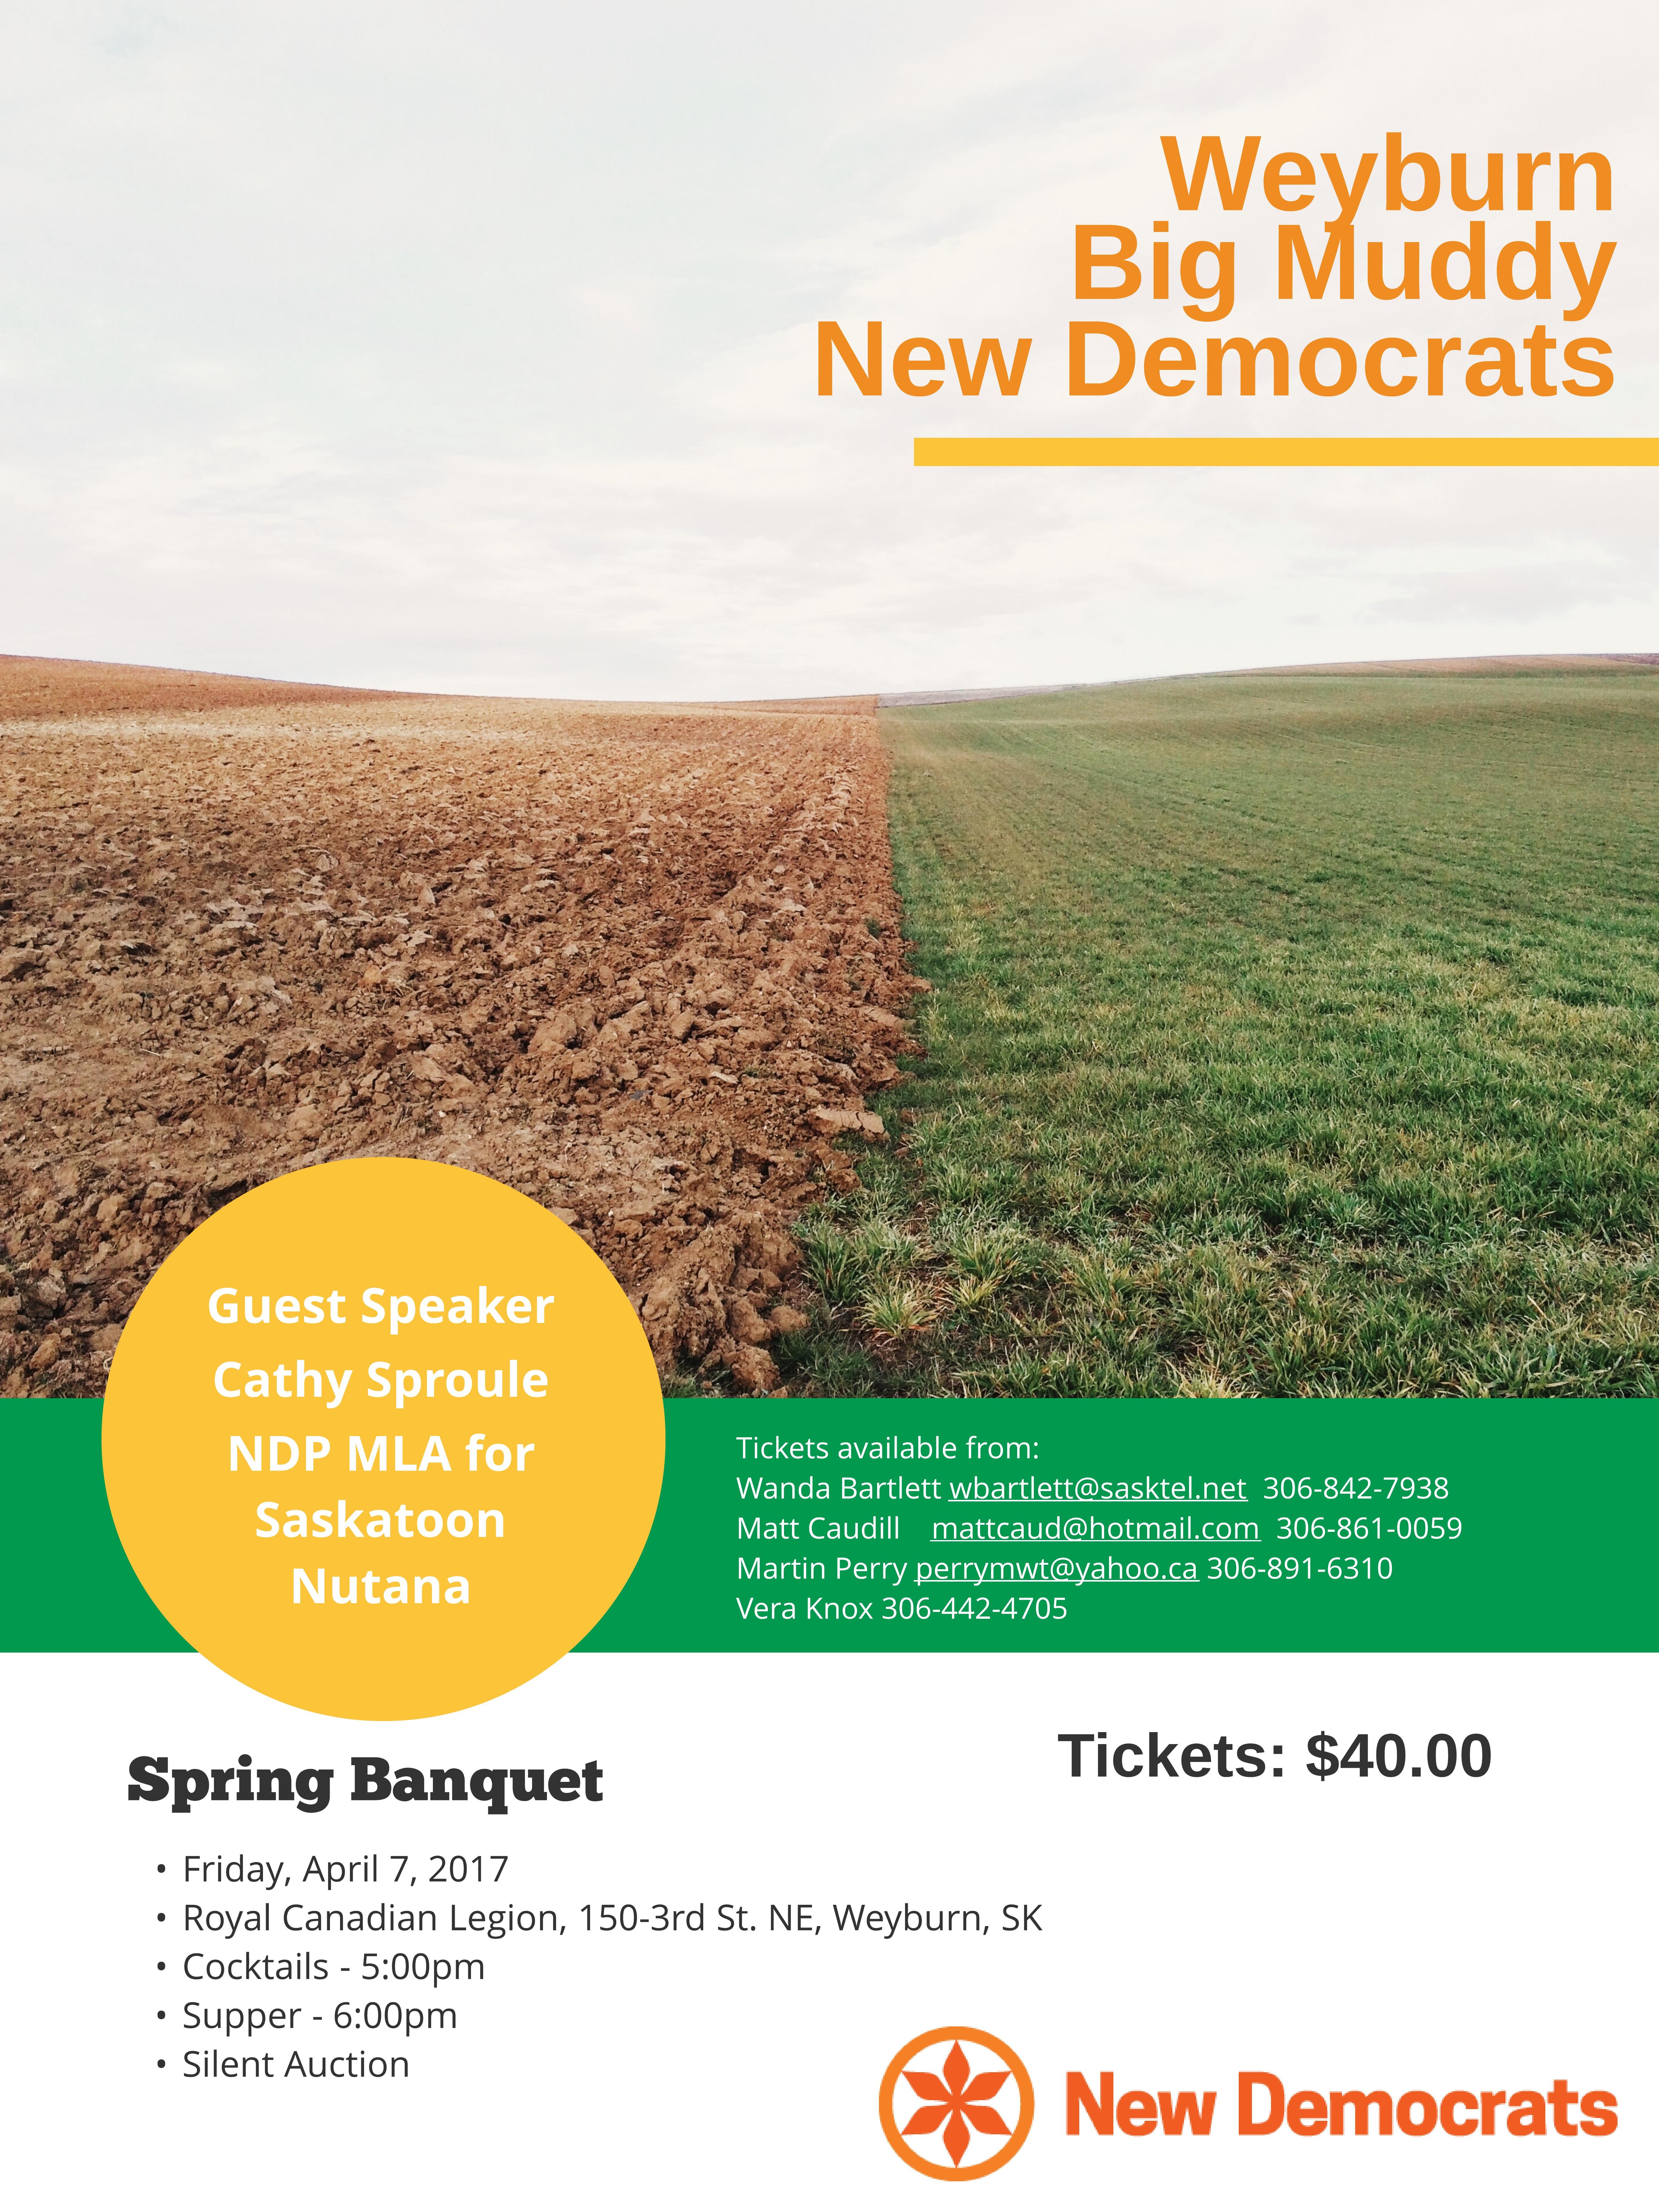 weyburn_spring_banquet.jpeg